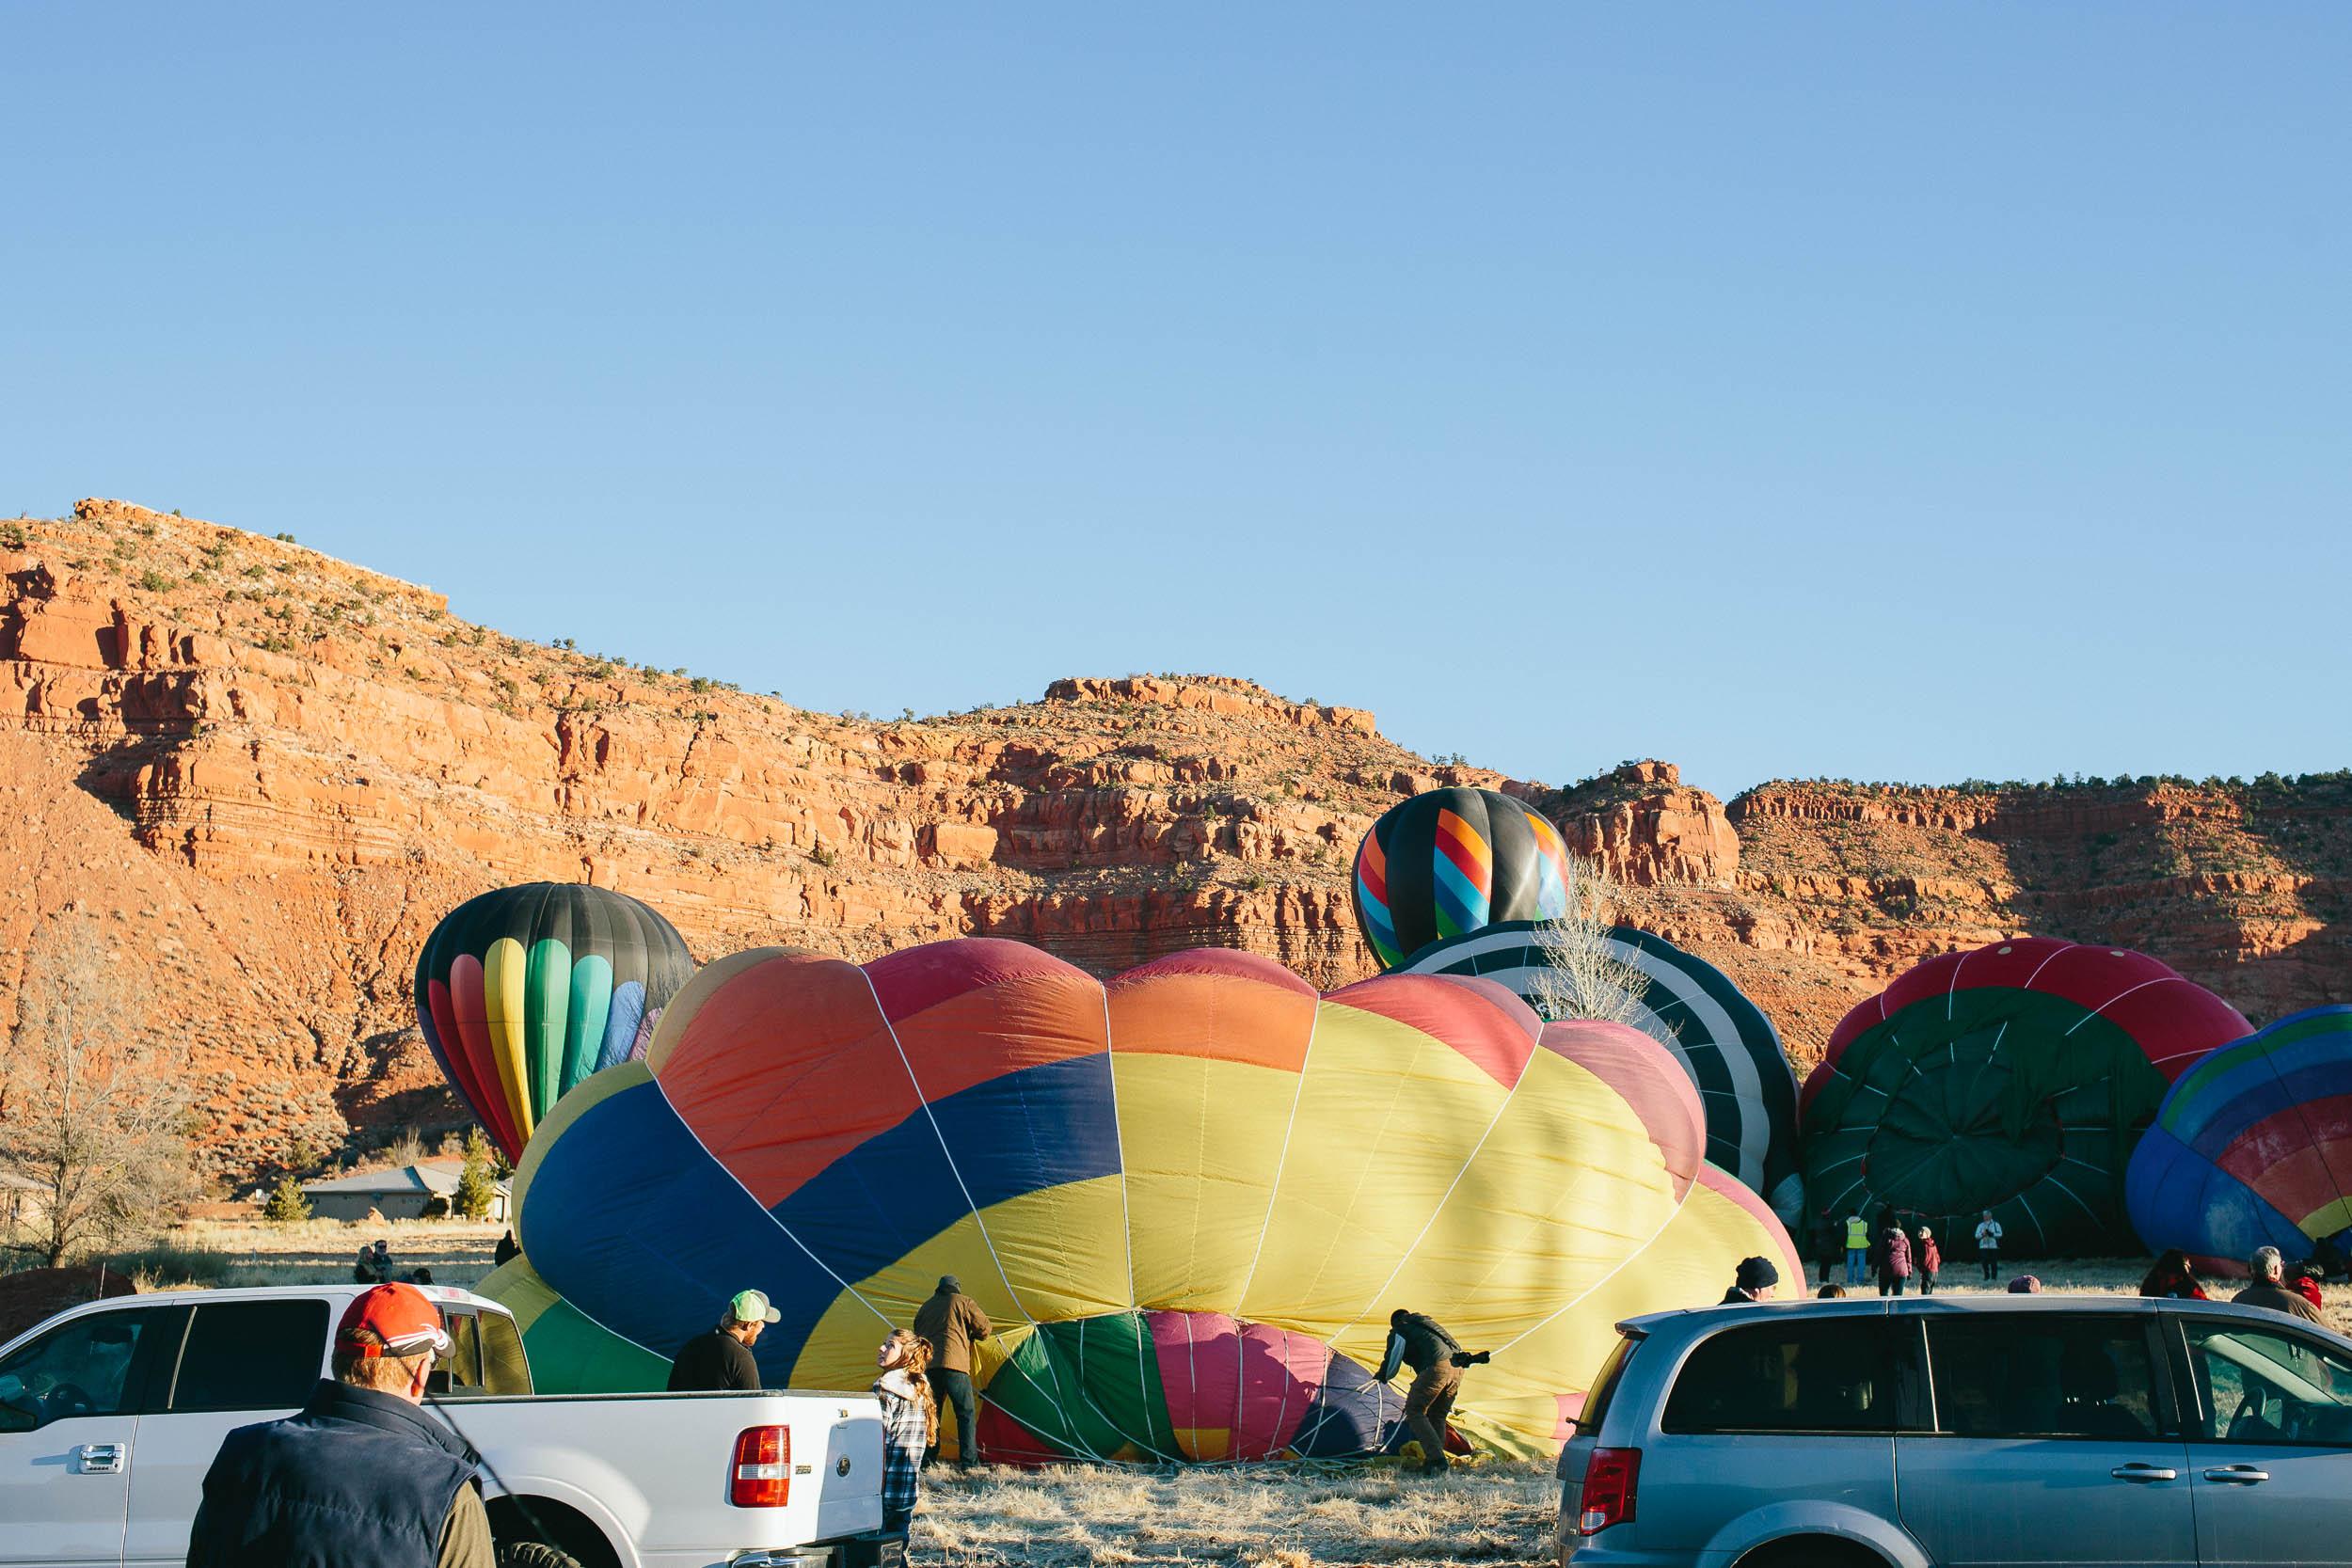 Kyle-Sheppard-Kanab-Balloon-Festival-1.jpg